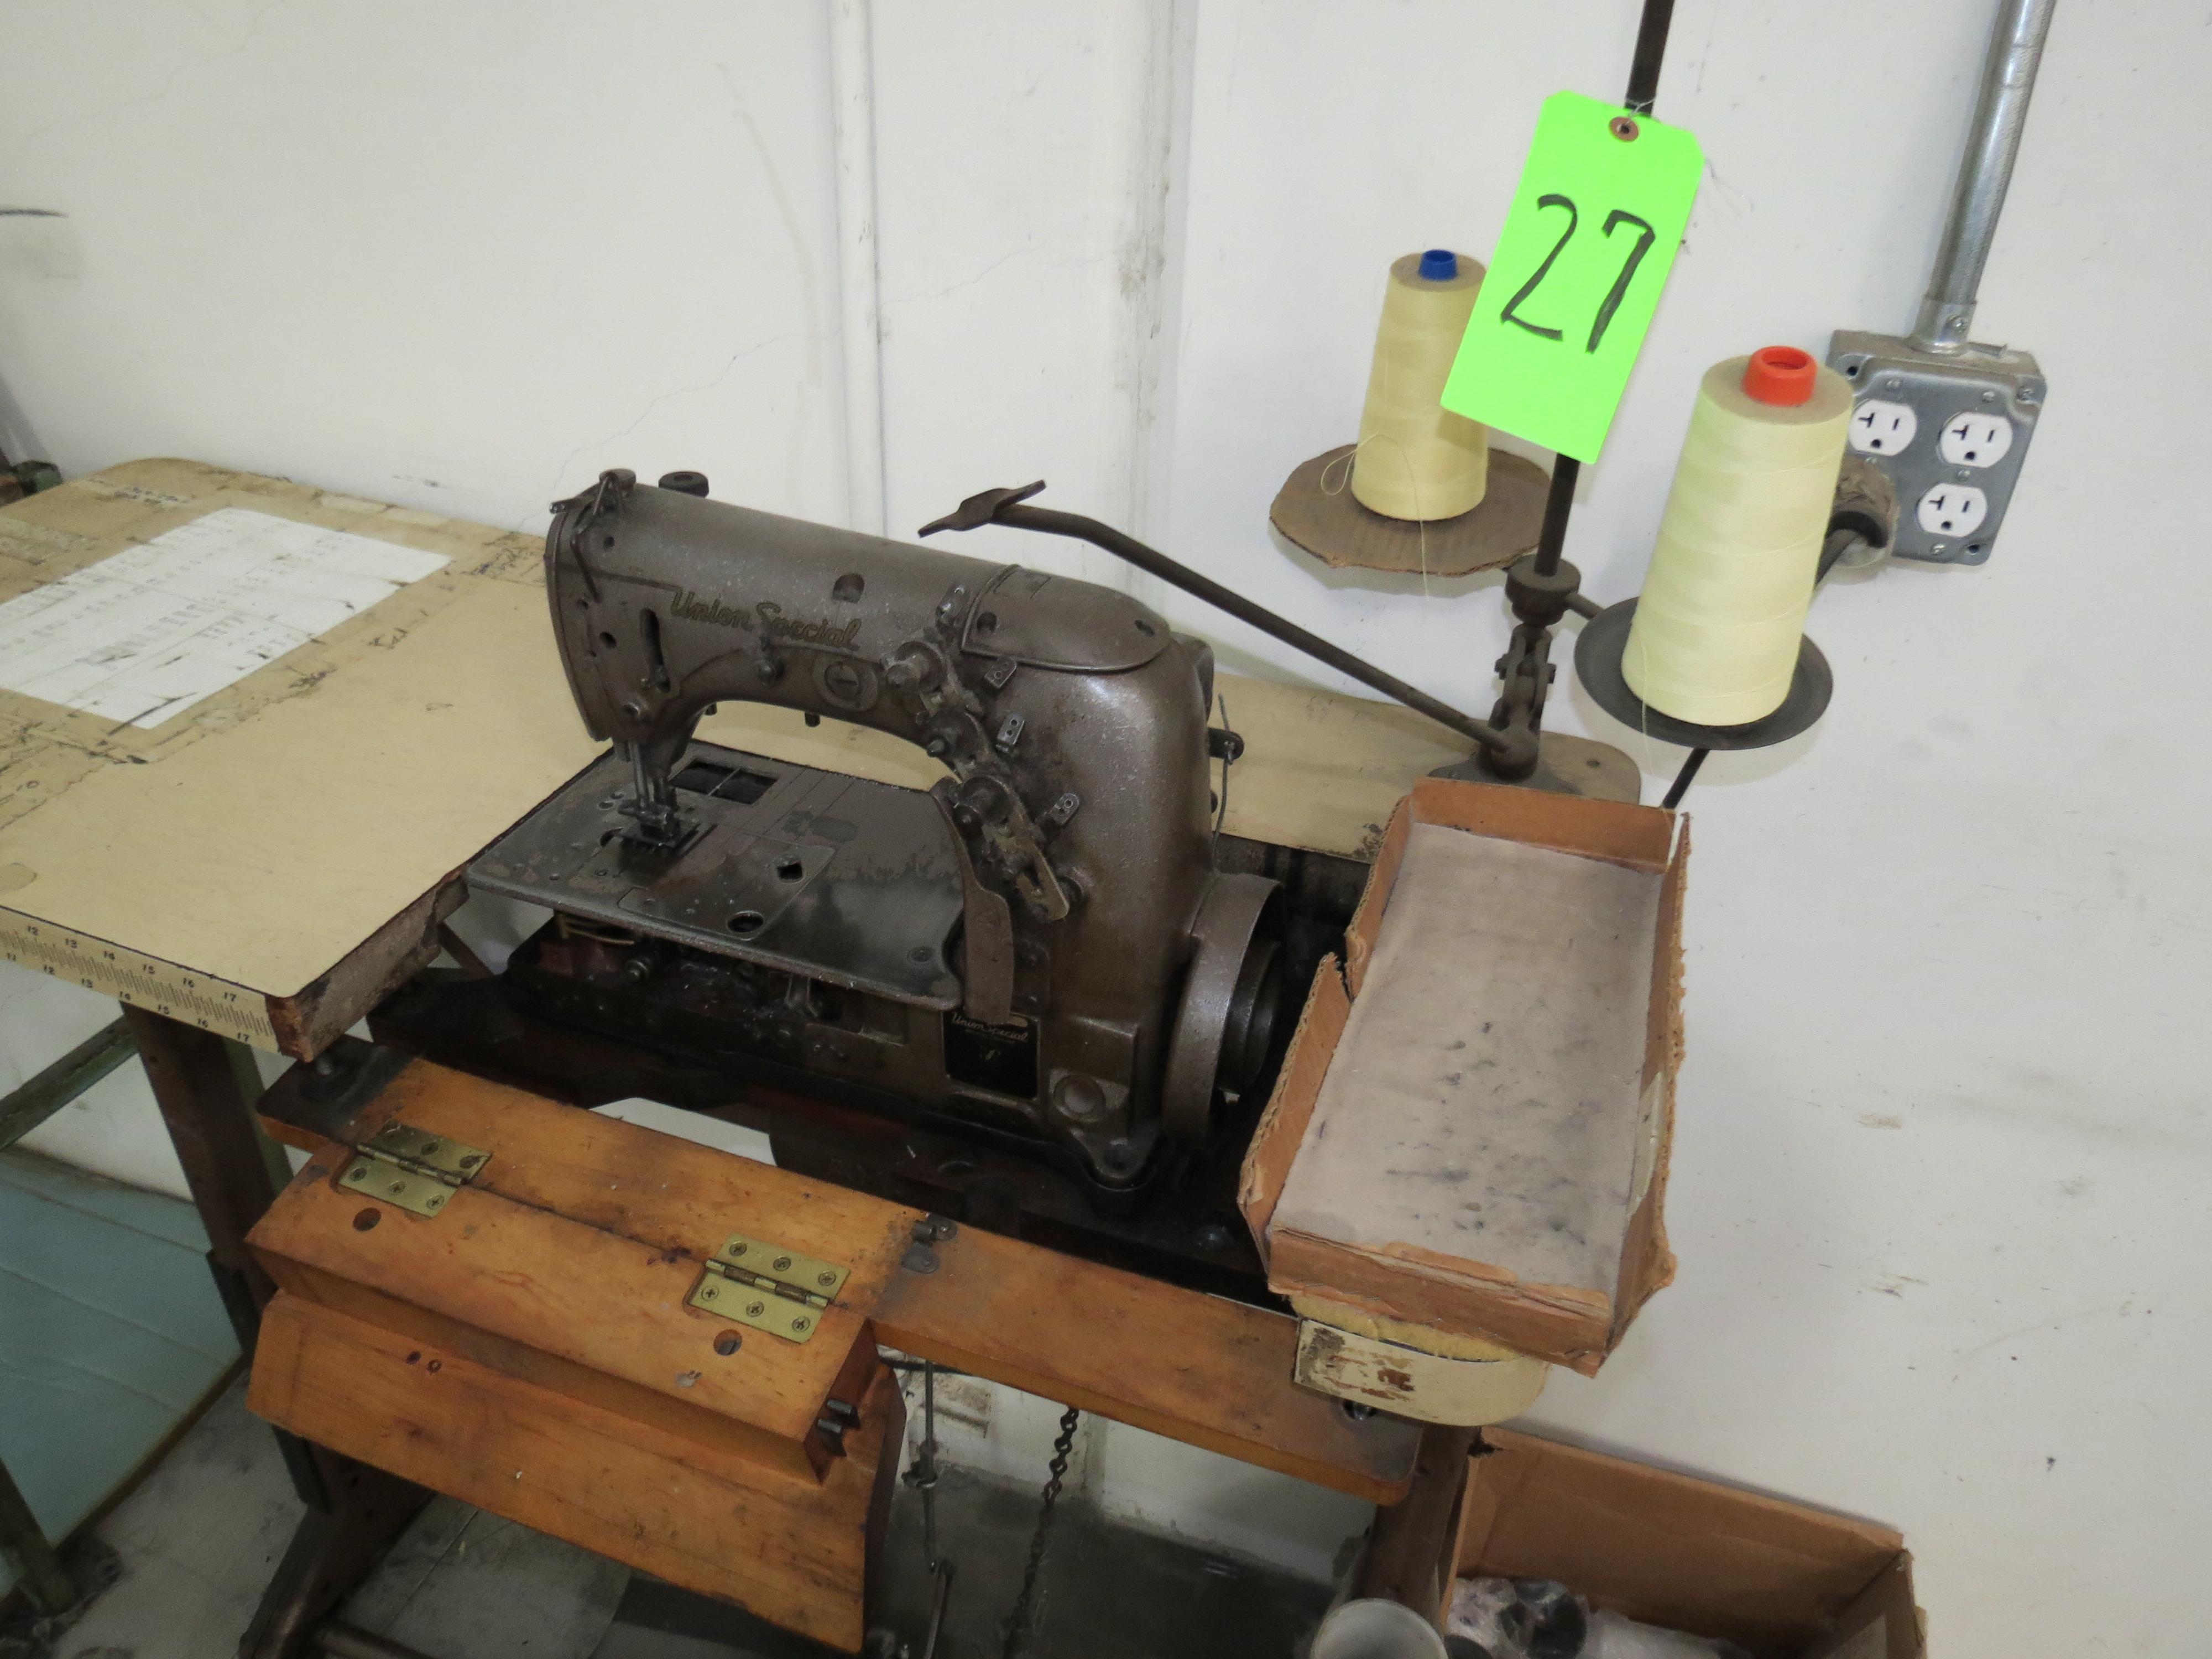 Union Special 51400 BEChain Stitch Sewing Machine, 110V